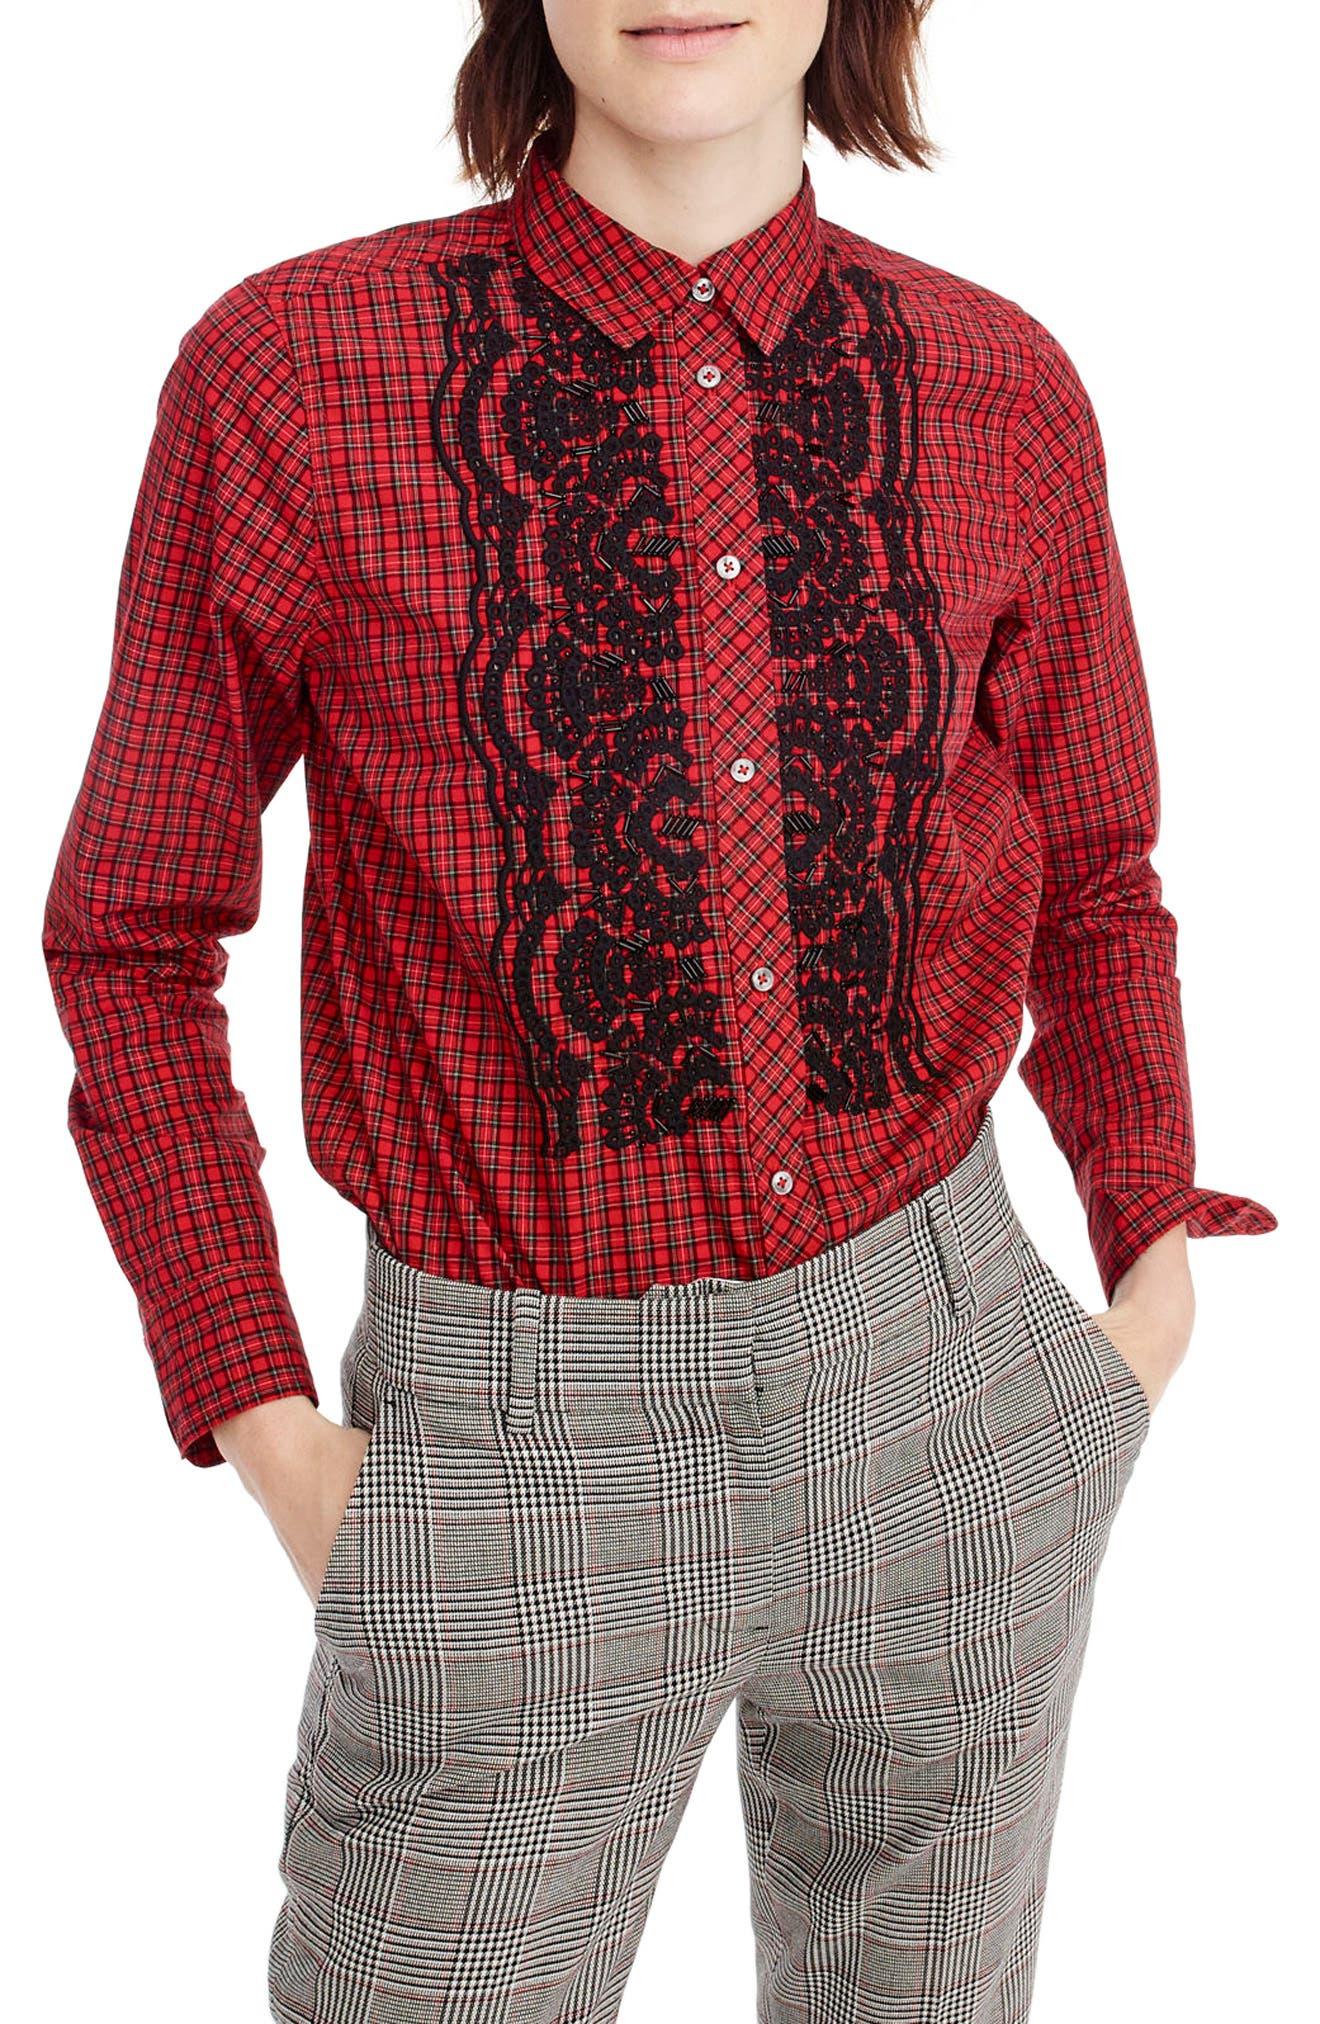 Main Image - J.Crew Embellished Plaid Boy Shirt (Regular & Petite)